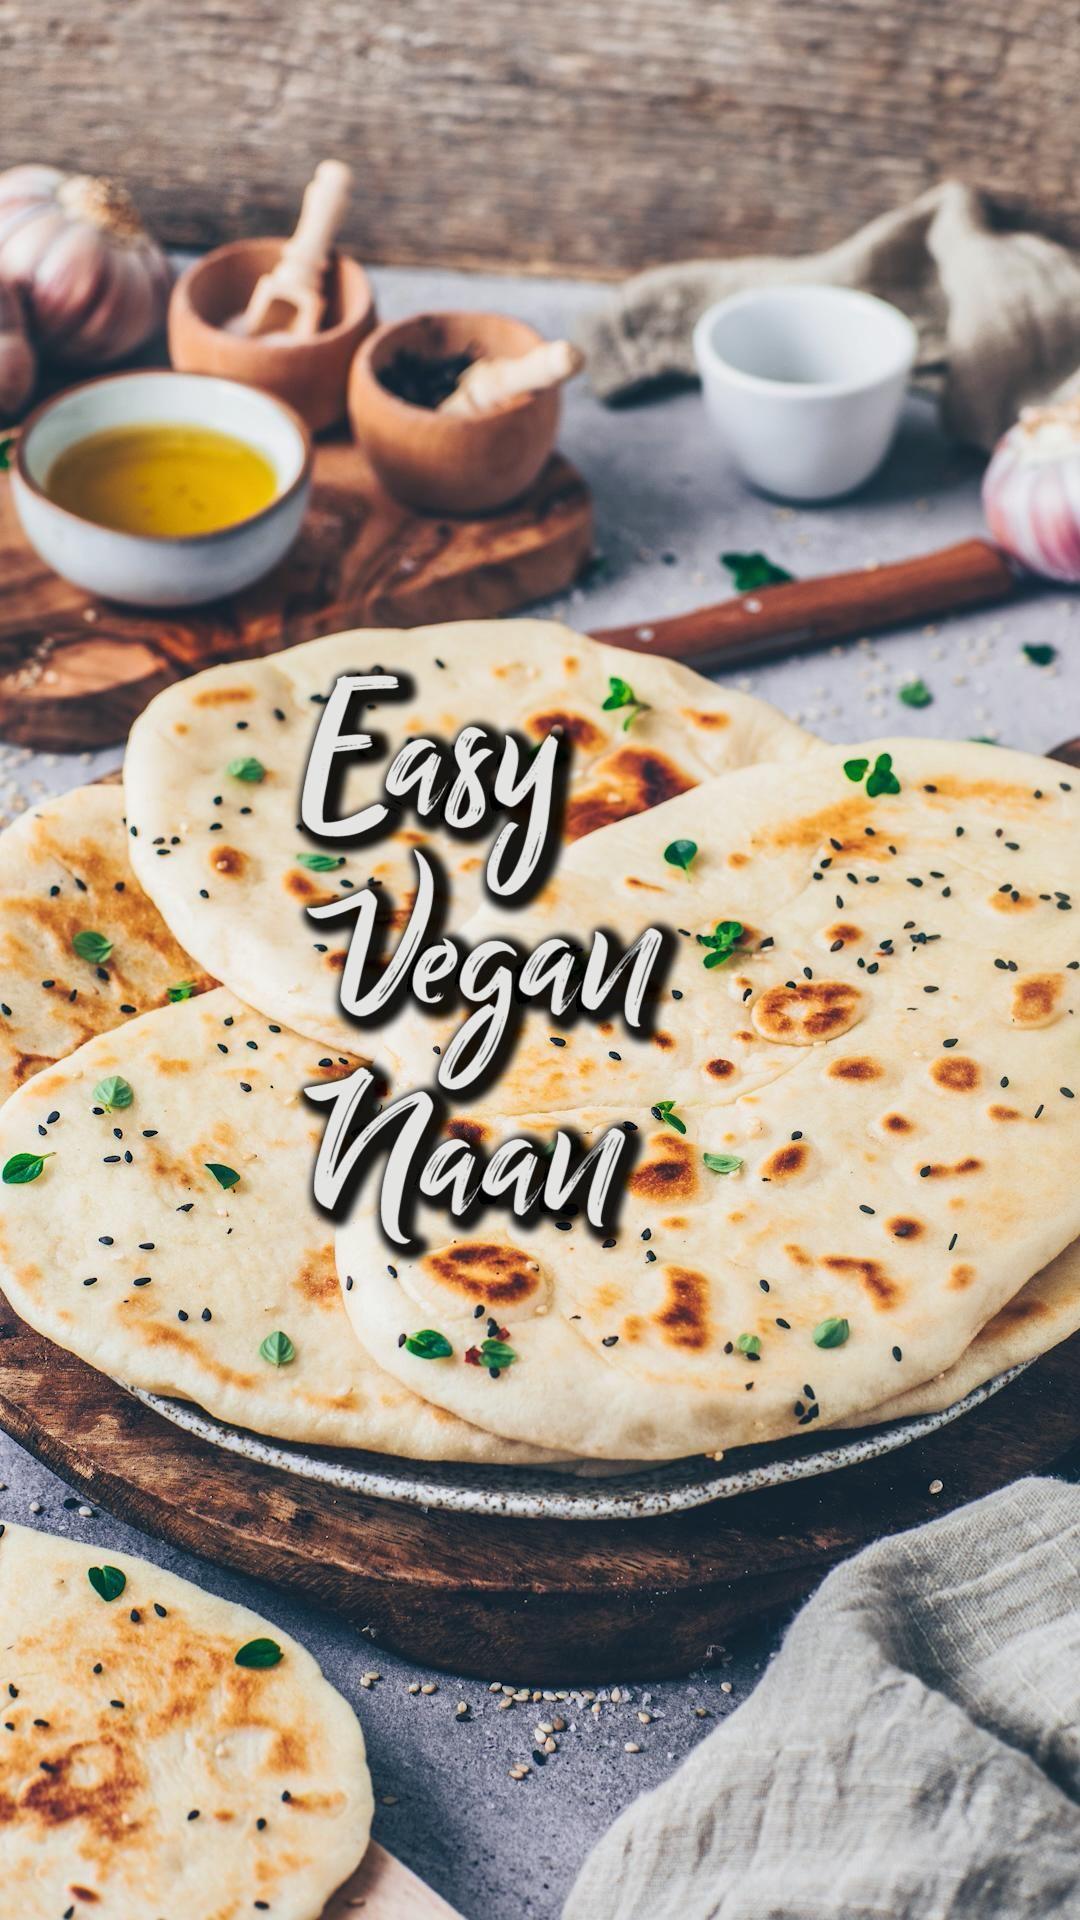 Vegan Naan Bread Easy Homemade Flatbread Bianca Zapatka Recipes Video Recipe Video In 2020 Naan Bread Vegan Naan Recipes